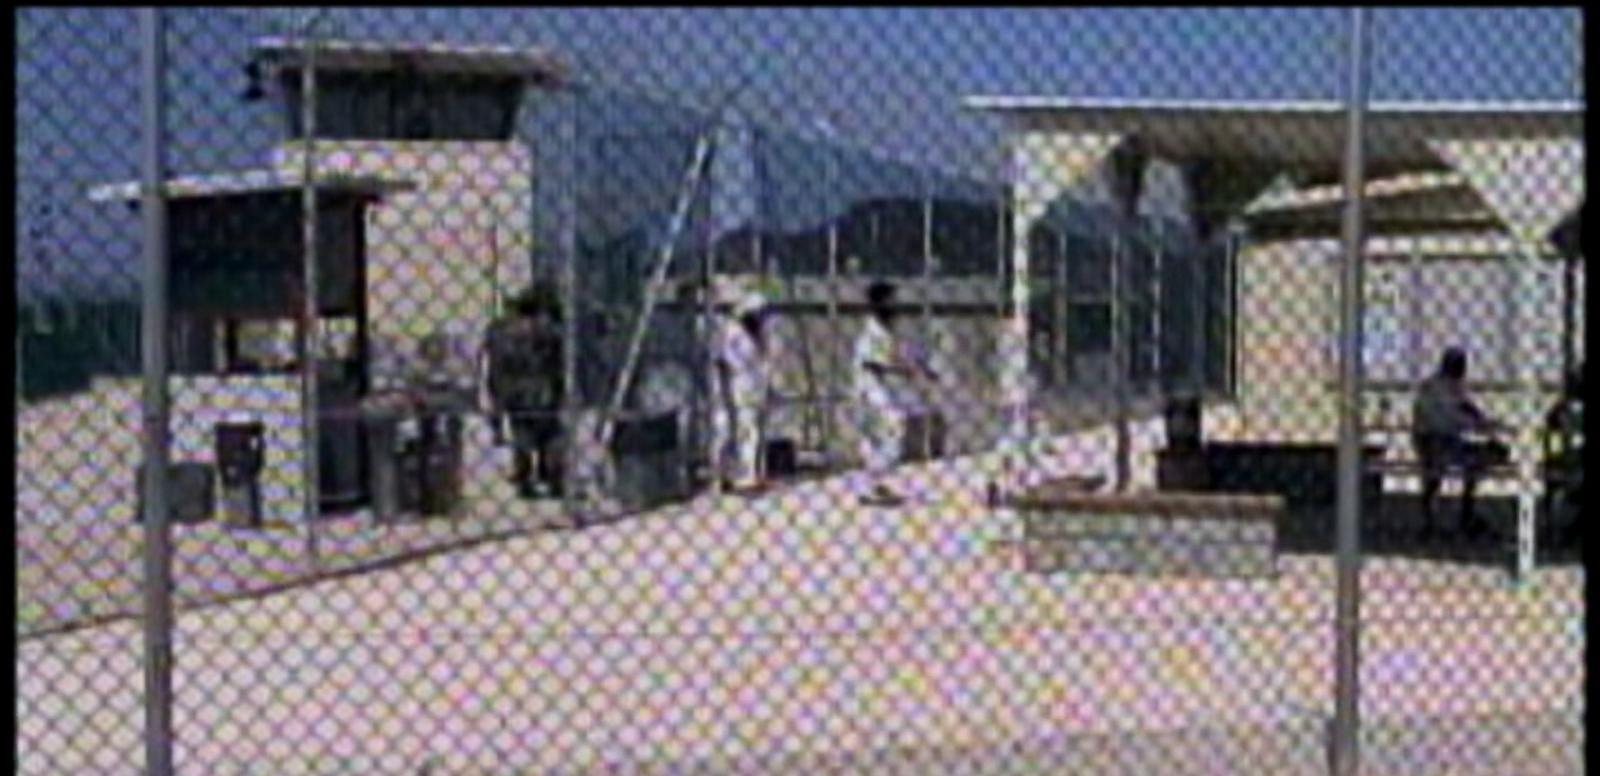 VIDEO: President Obama Vows to Close Guantanamo Bay